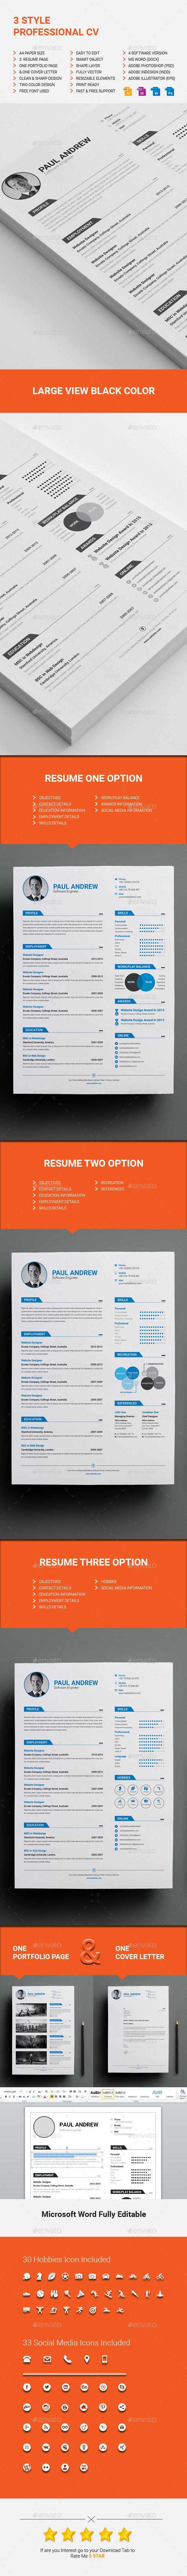 3 Style Professional CV Price 9